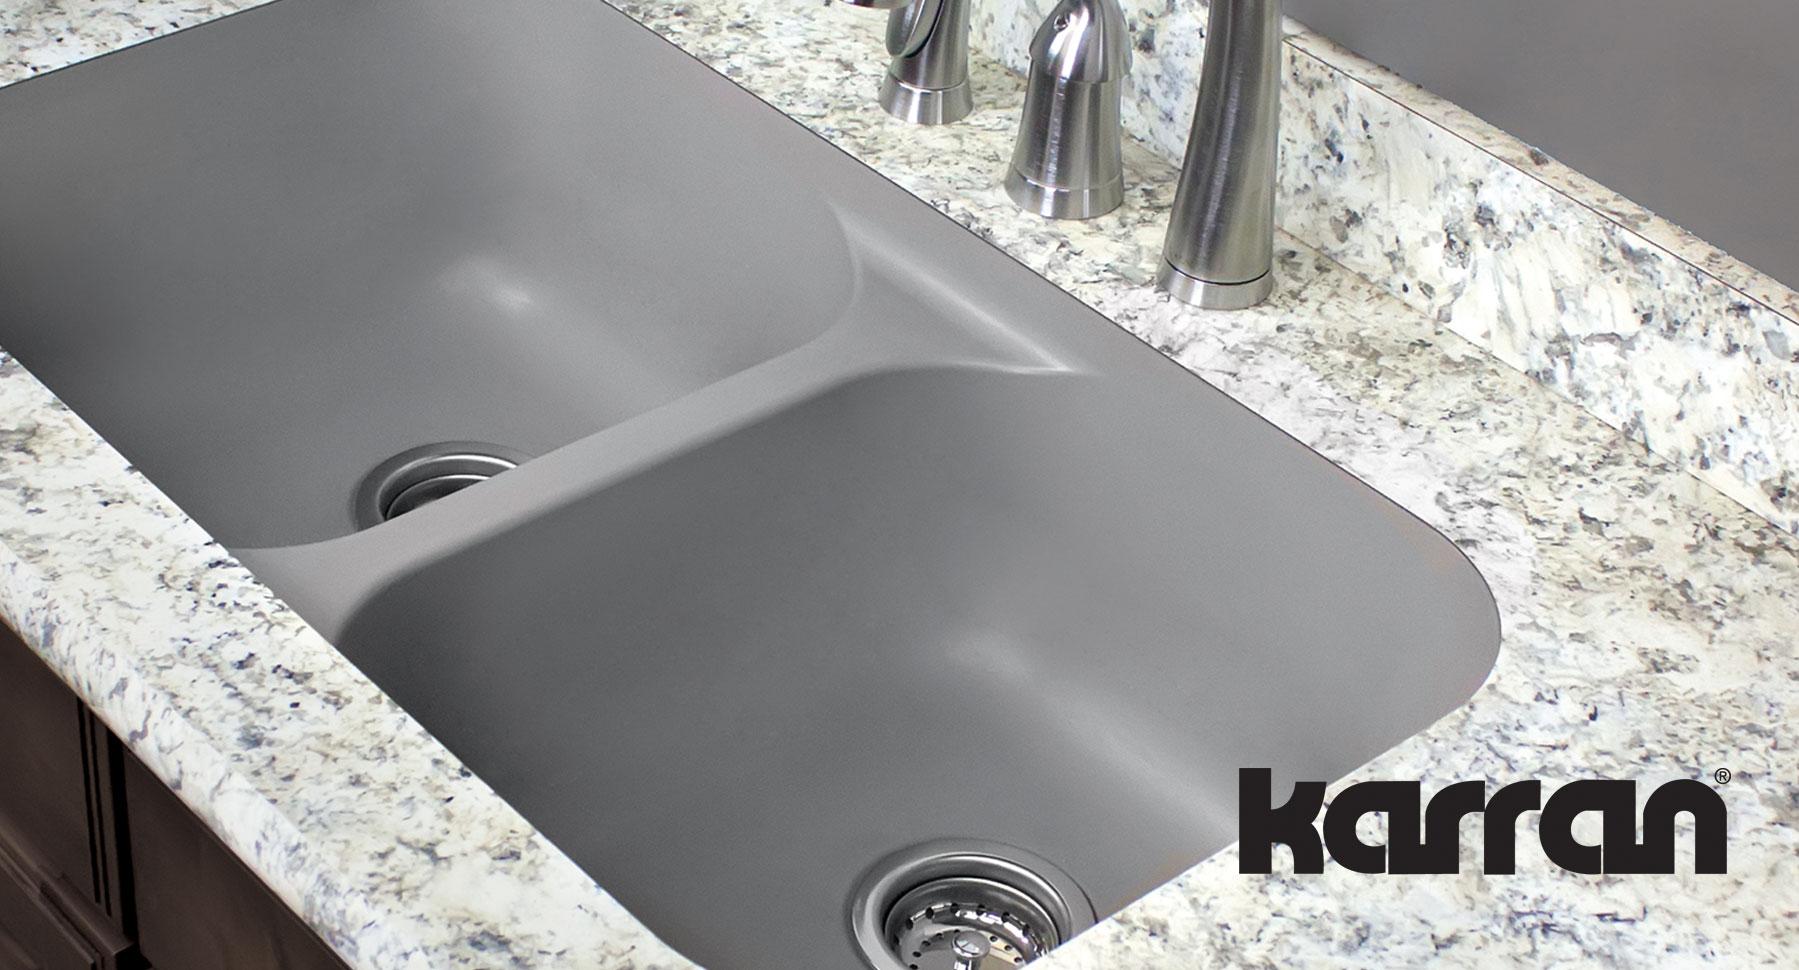 Karran-Header-slide1